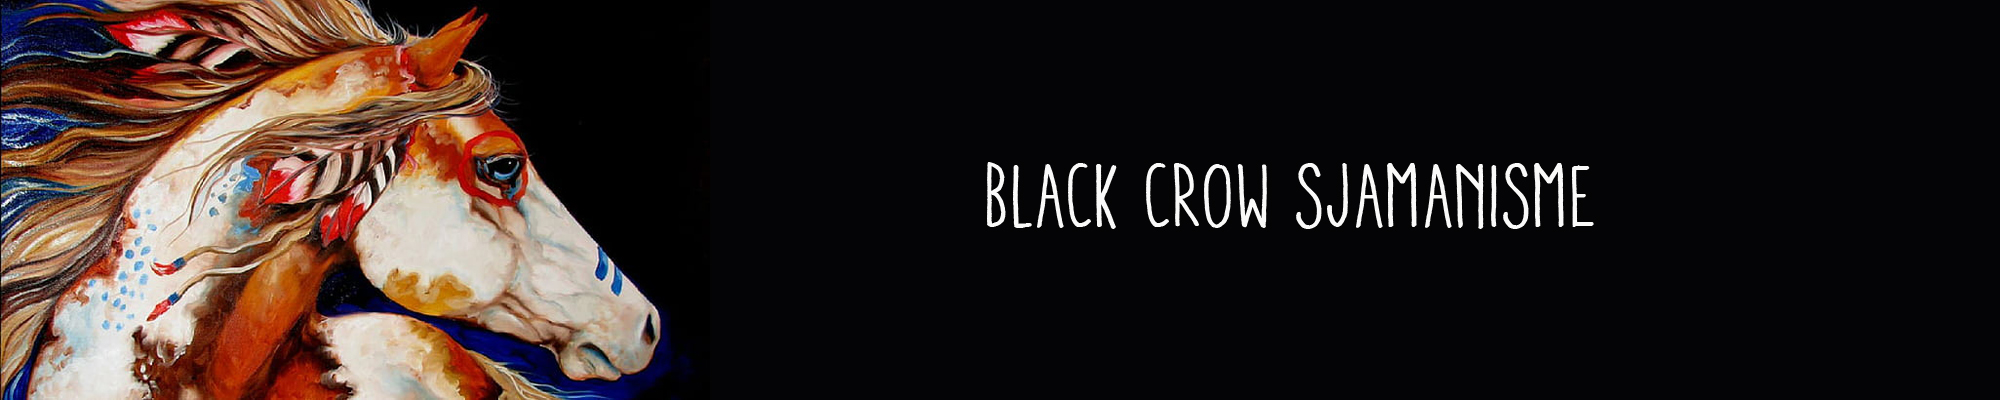 Black Crow Sjamanisme